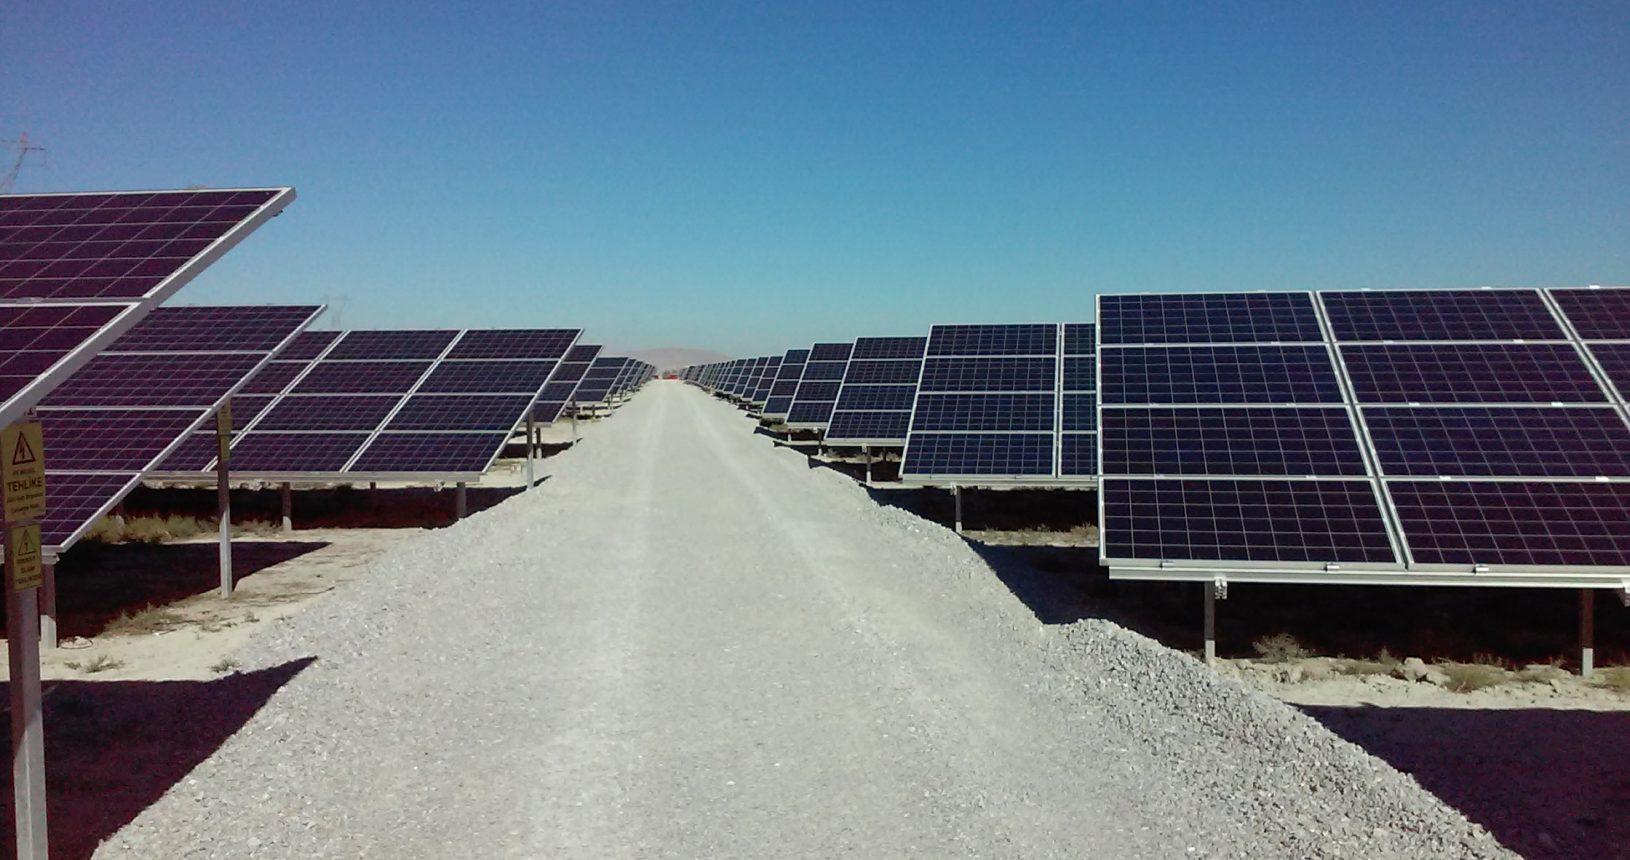 Arazi Üzeri Ges 19 - Heran Enerji